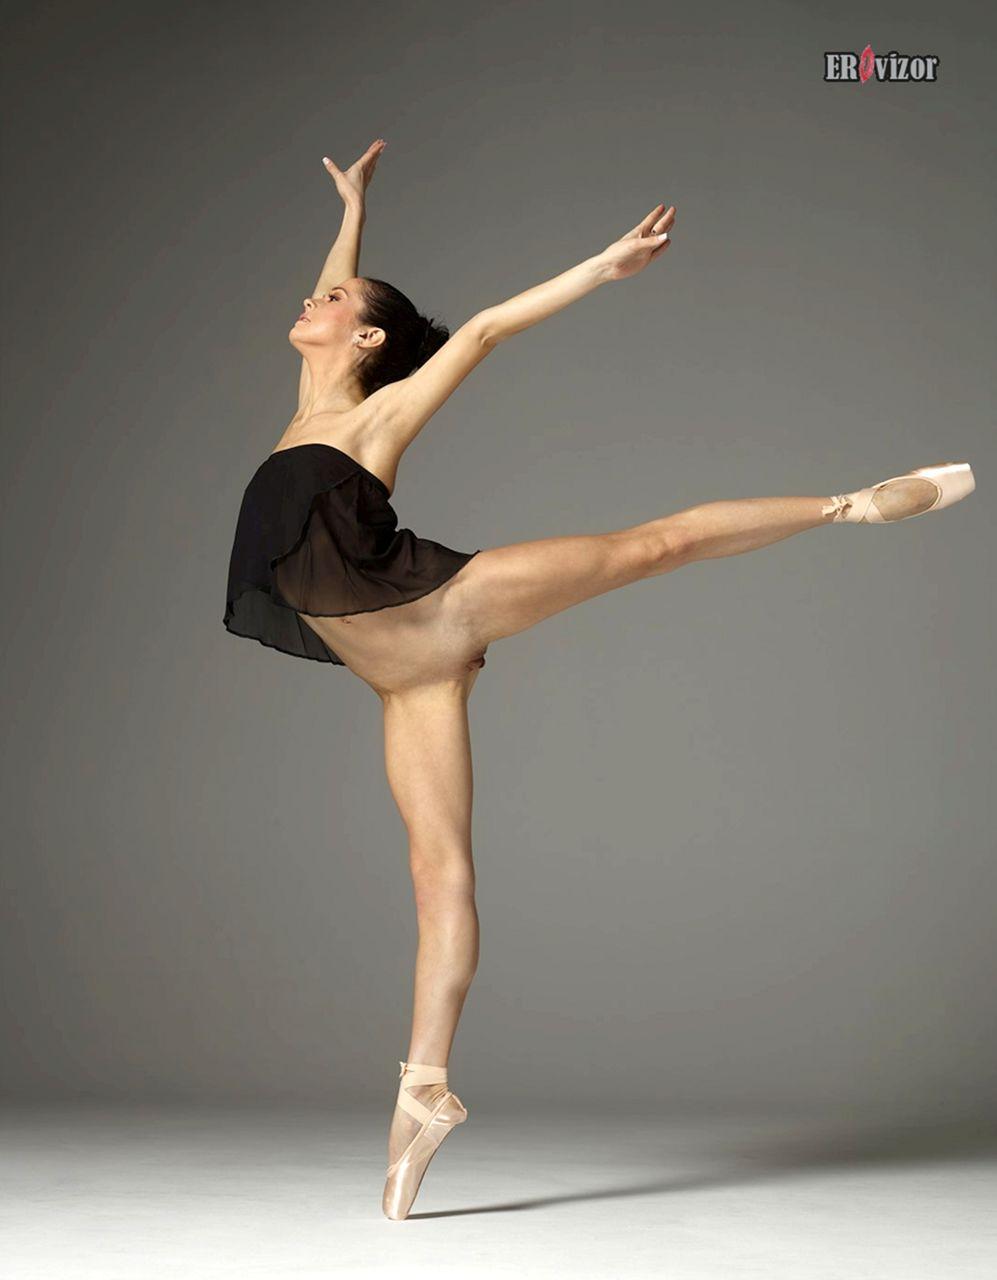 magdalena-bare-ballet-erptoca-9